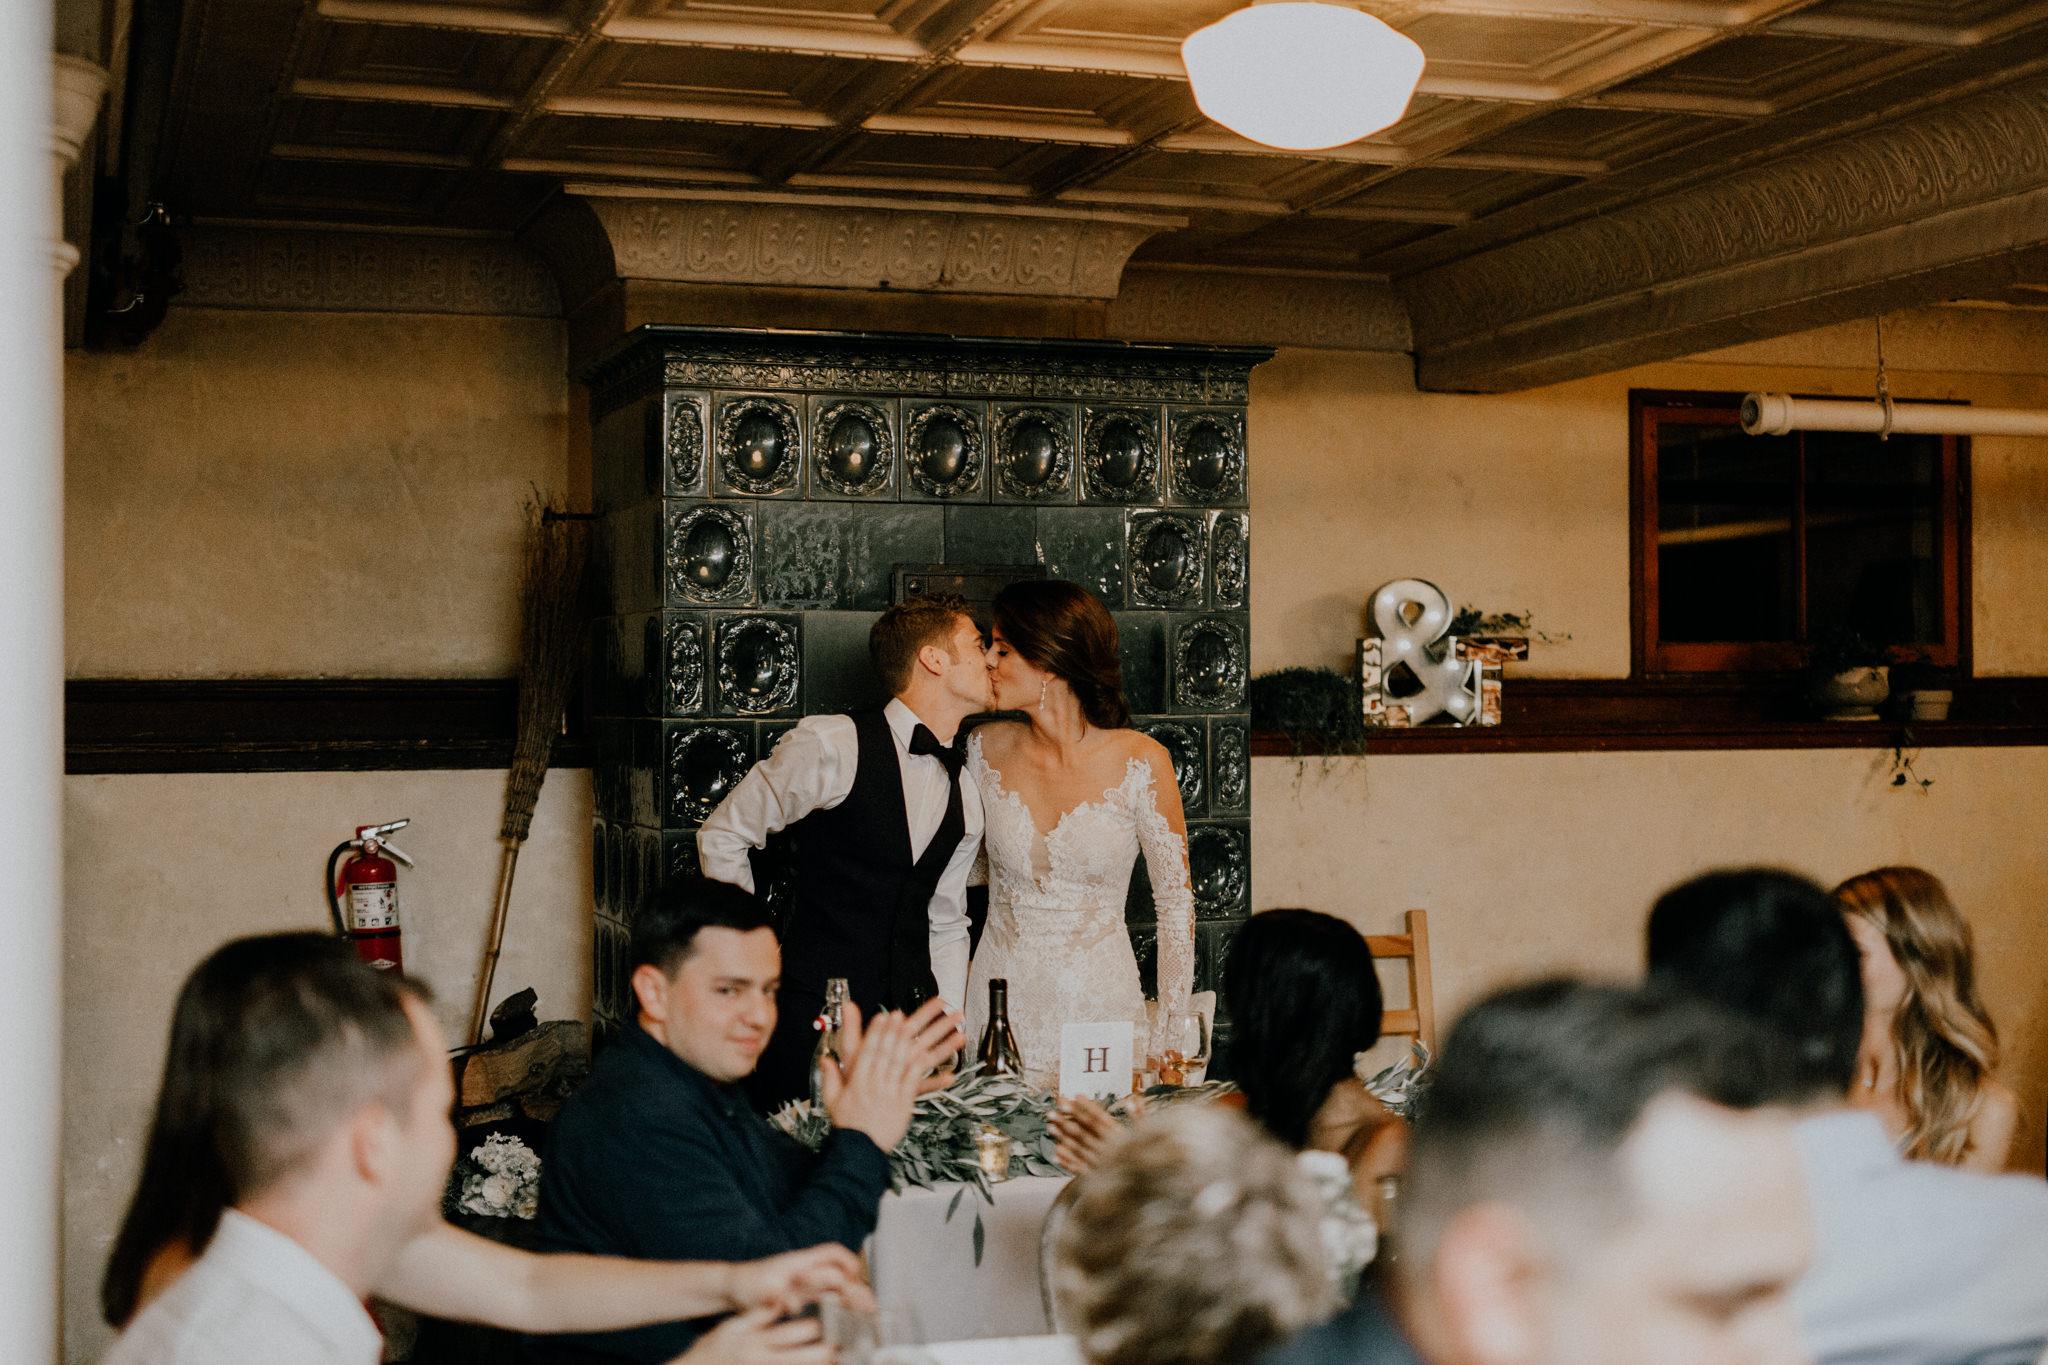 wedding-headlands-center-for-the-arts-sausalito-129.jpg